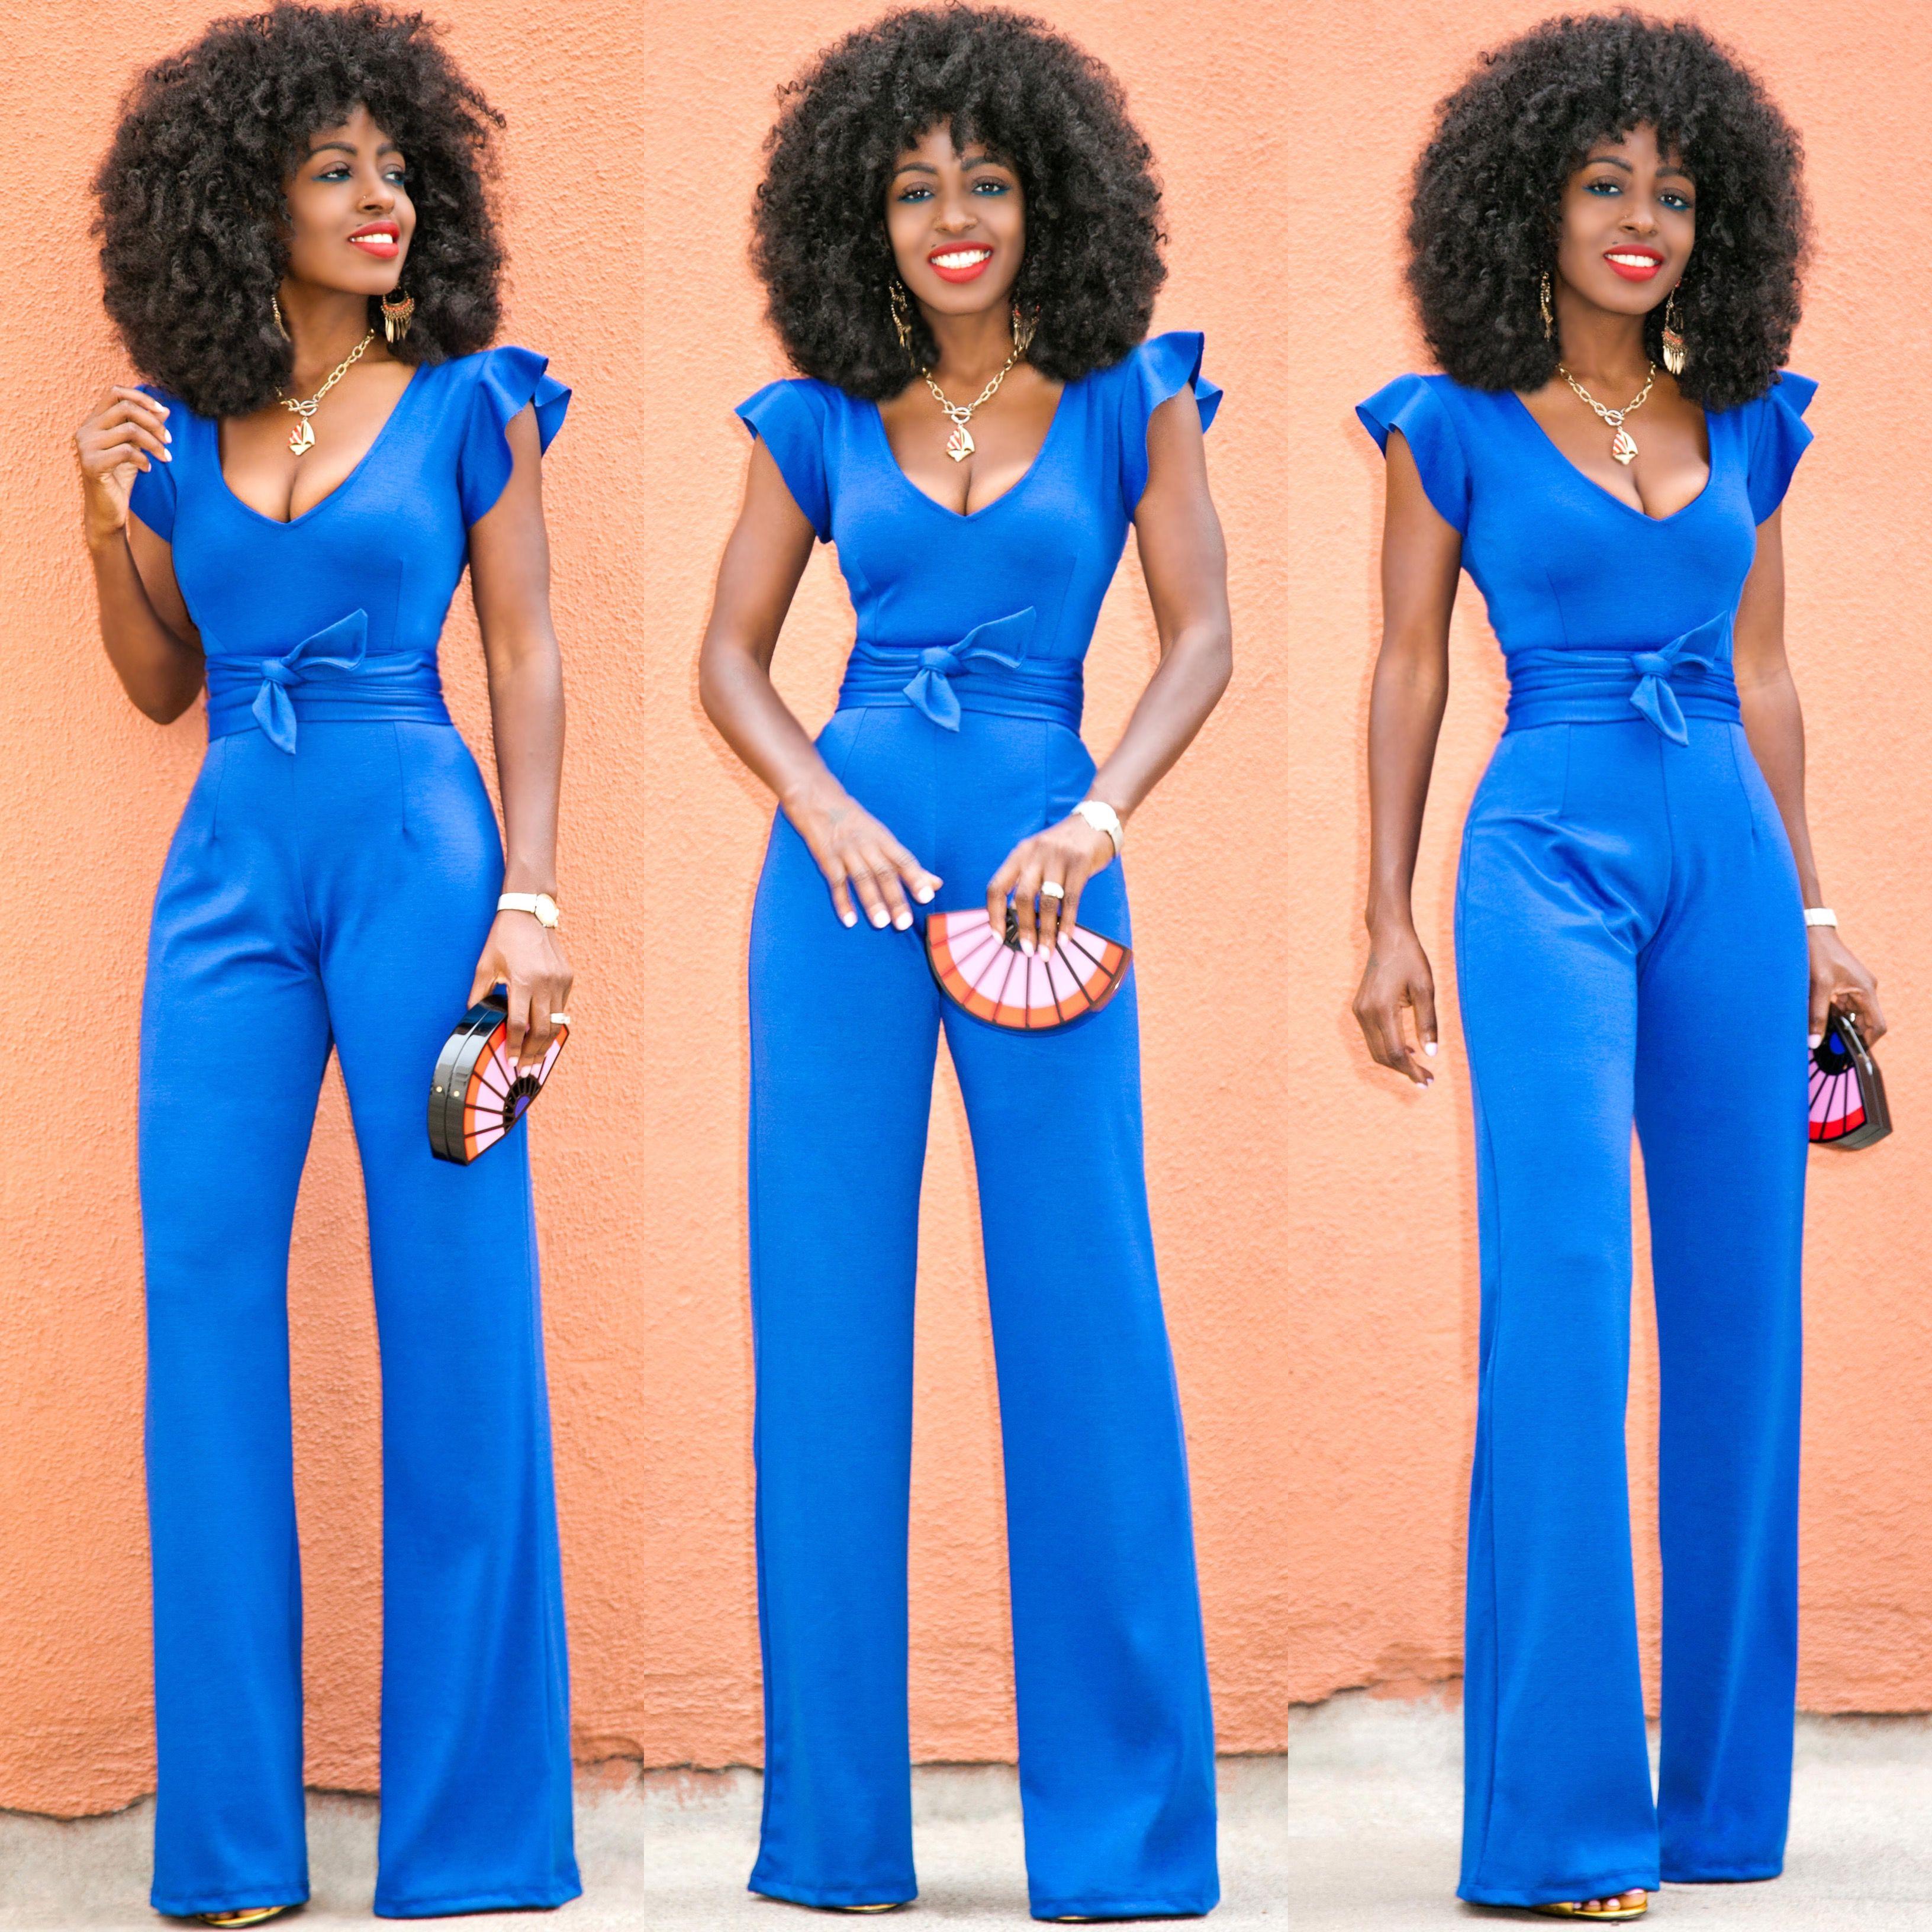 Short Frill Sleeves Jumpsuit | My Style | Pinterest | Shorts ...